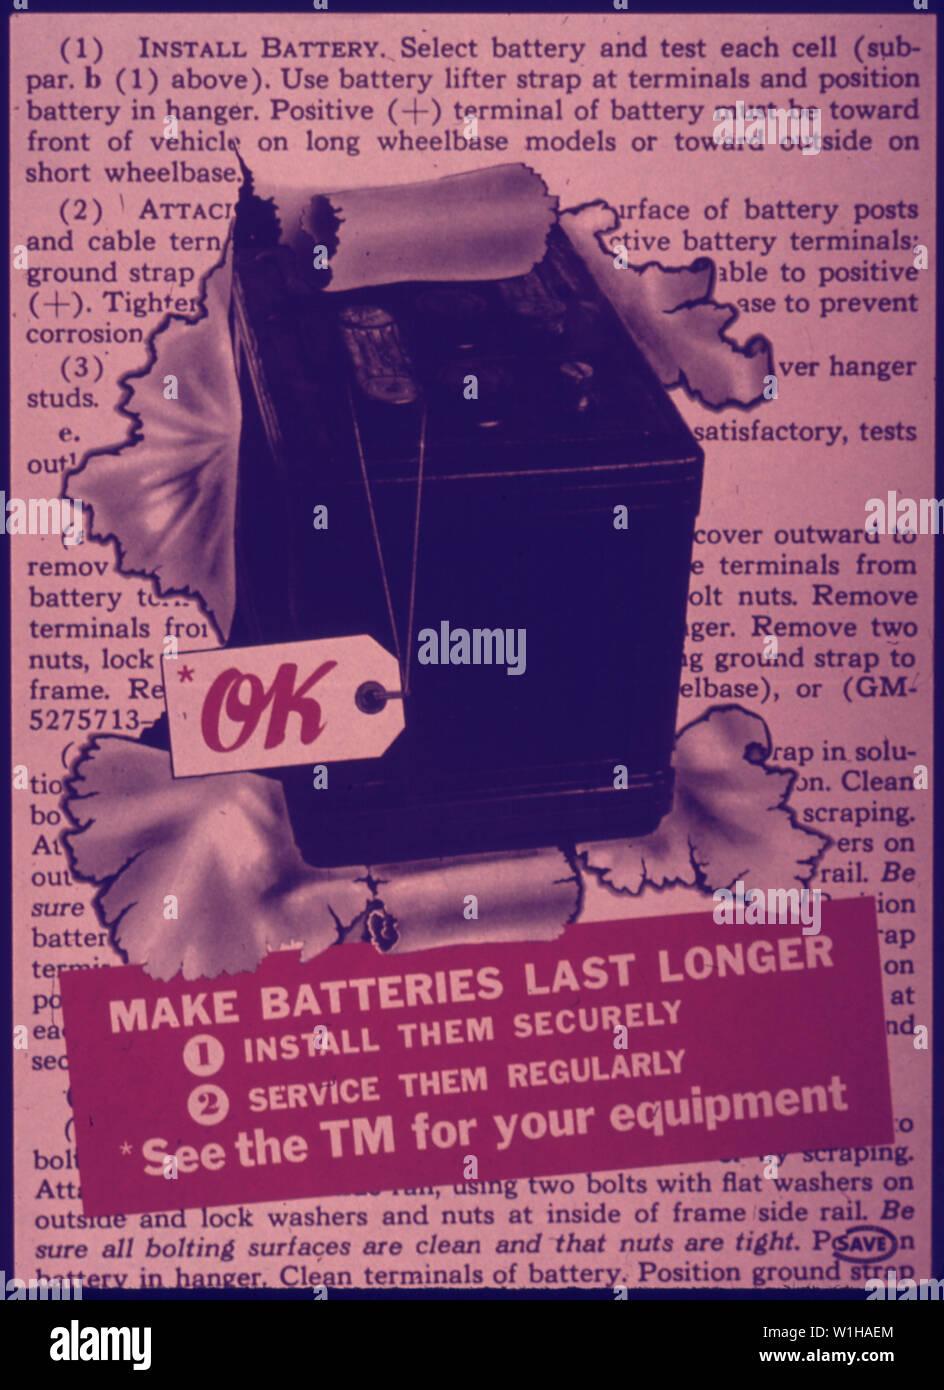 OK MAKE BATTERIES LAST LONGER Stock Photo: 259151612 - Alamy